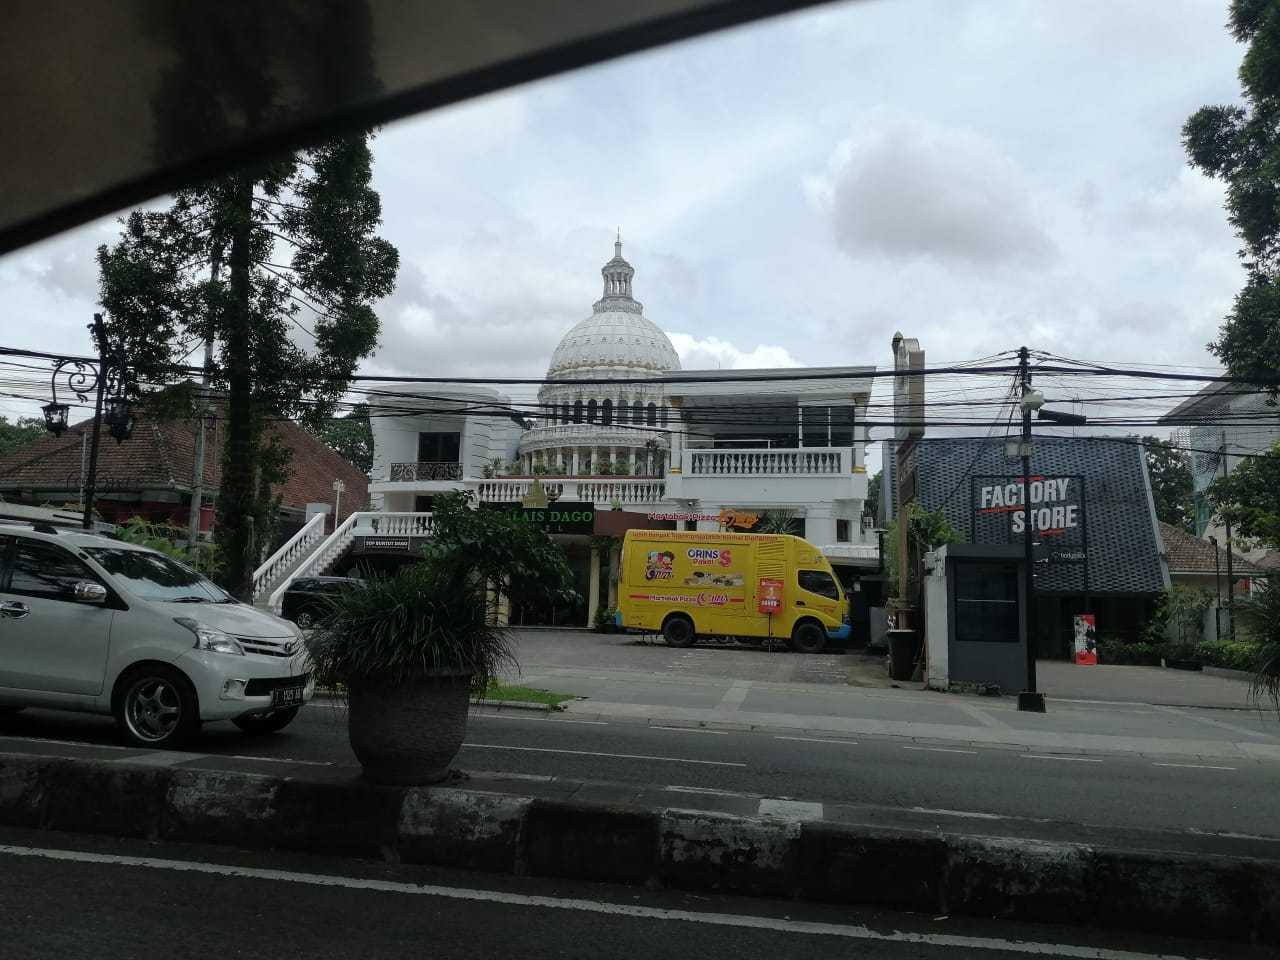 Ear Sitek The Palais Hotel Dago, Kecamatan Coblong, Kota Bandung, Jawa Barat, Indonesia Dago, Kecamatan Coblong, Kota Bandung, Jawa Barat, Indonesia Ear-Sitek-The-Palais-Hotel  127397